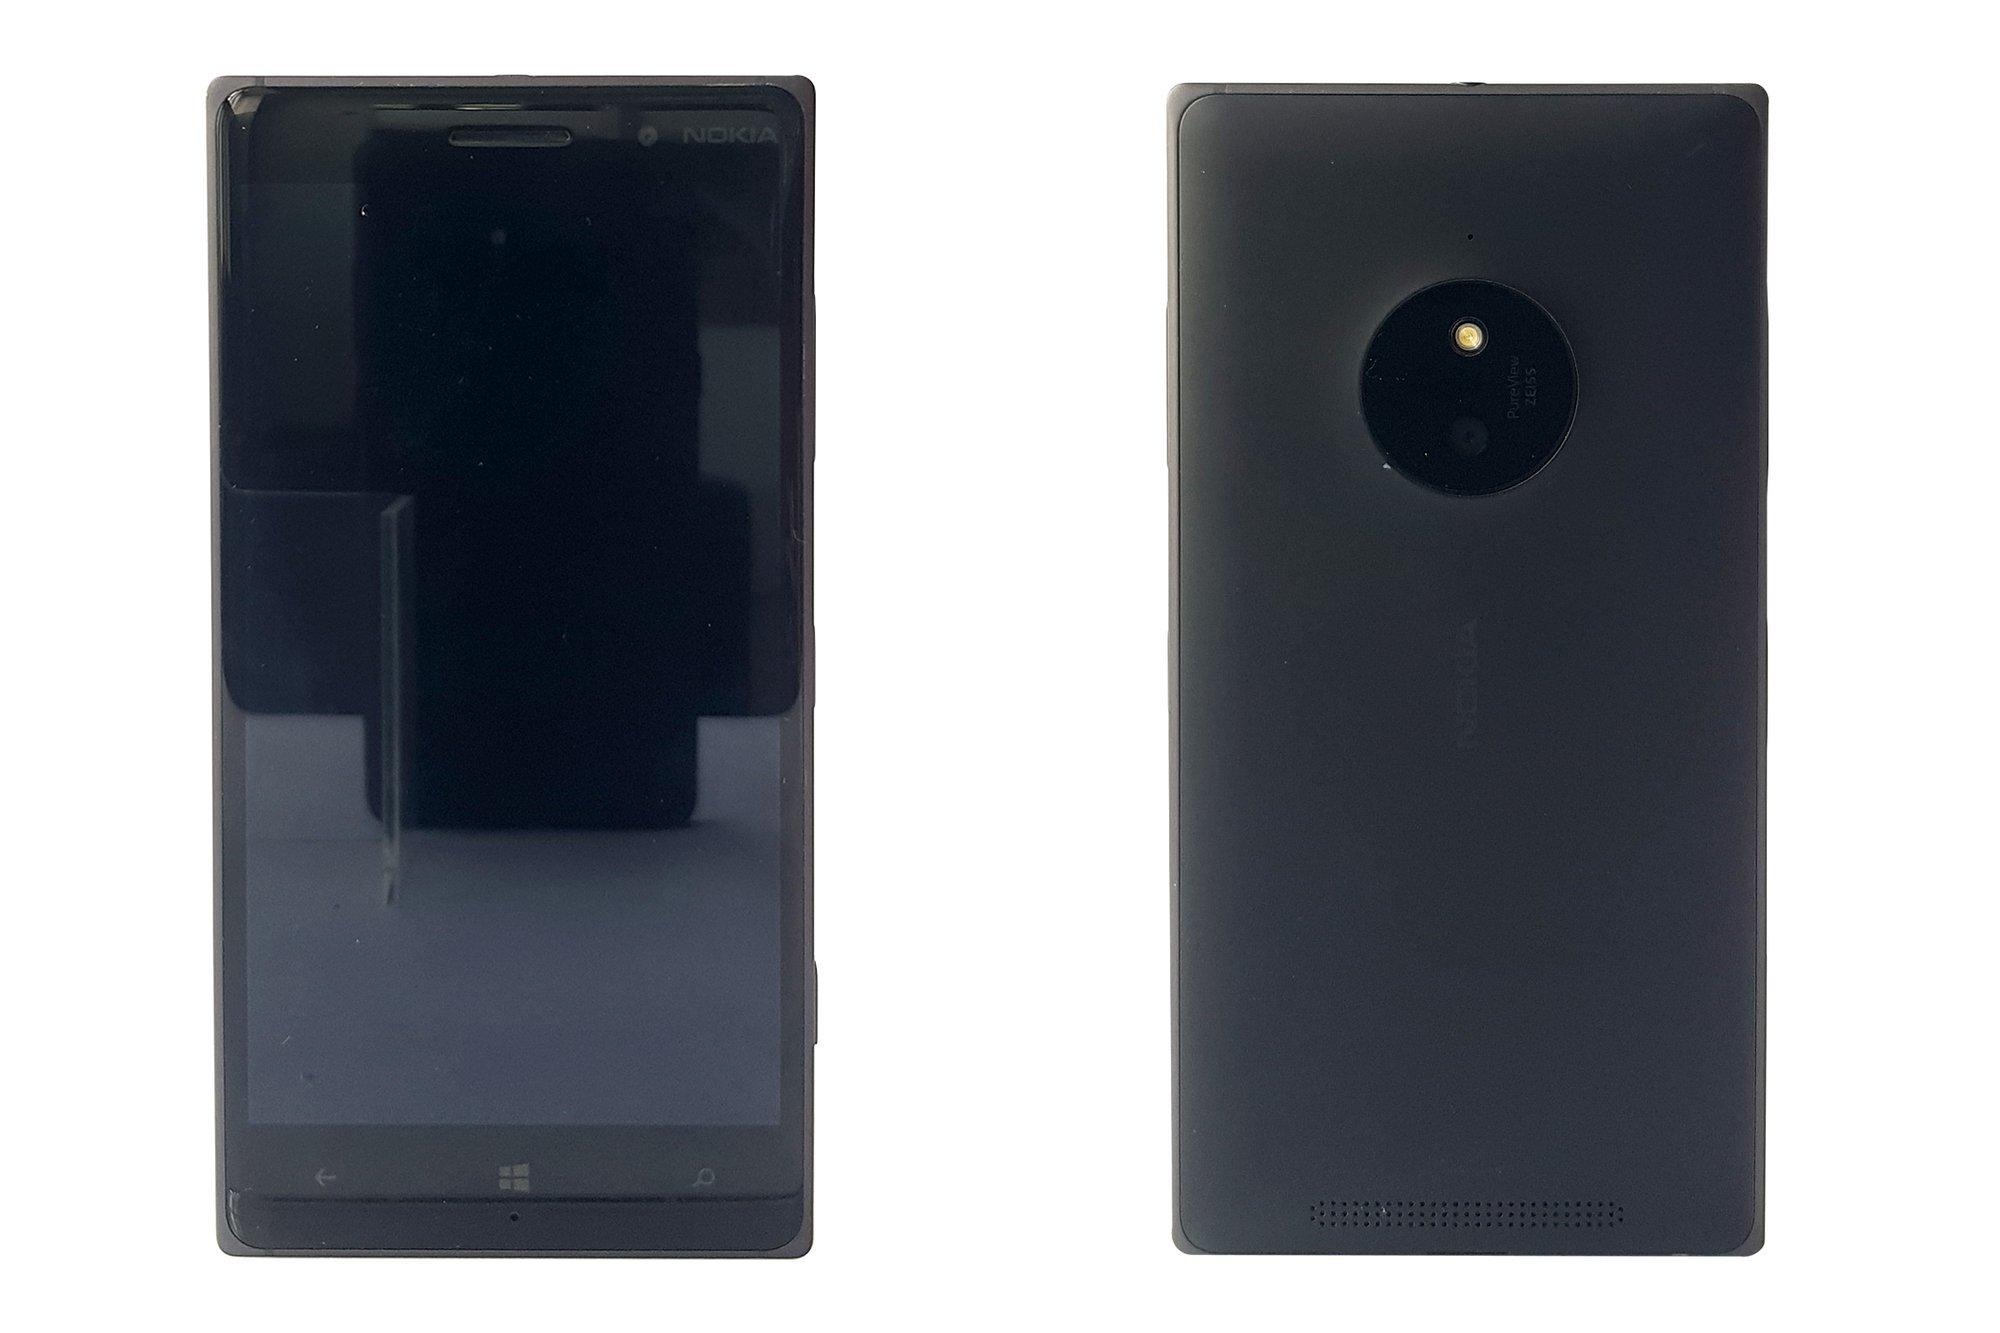 Smartphone Nokia Lumia 830 RM-984 LTE Black Damaged